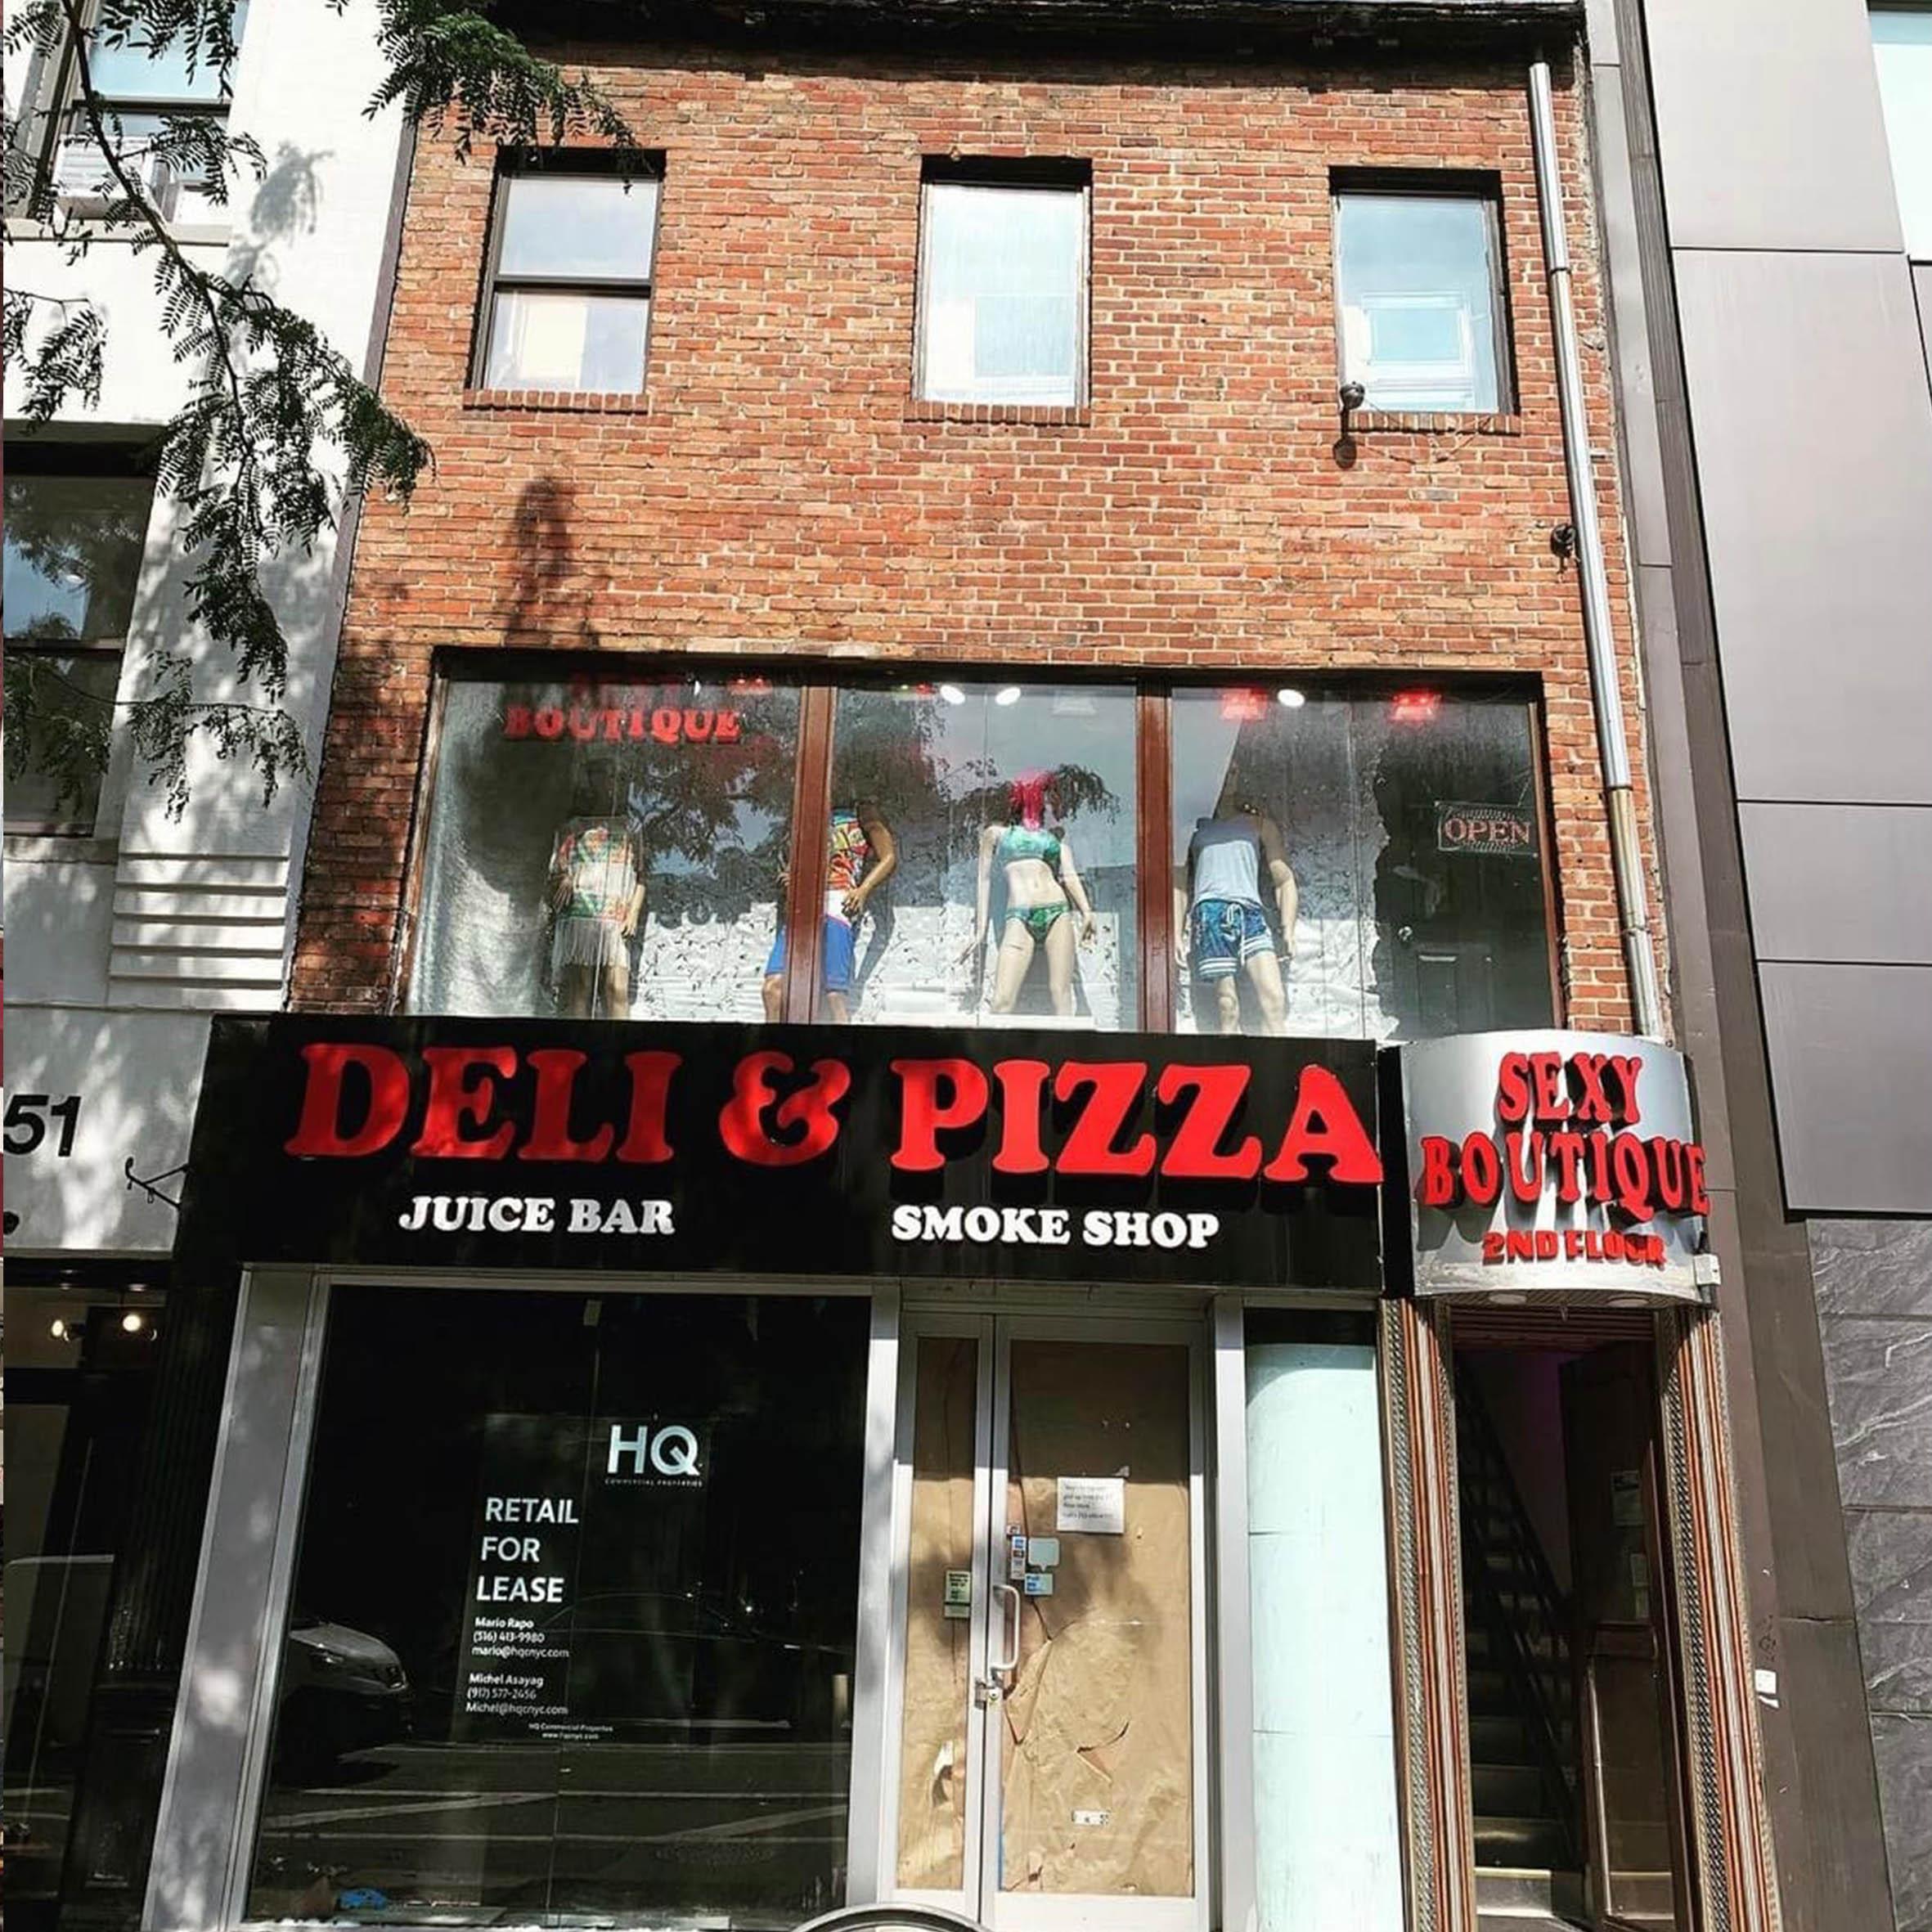 Retail for LEASE 155 Eight Avenue NYC 1700                     sq plus 1700 sq Basement Asking $15000                                                                           Mario@hqcnyc.com